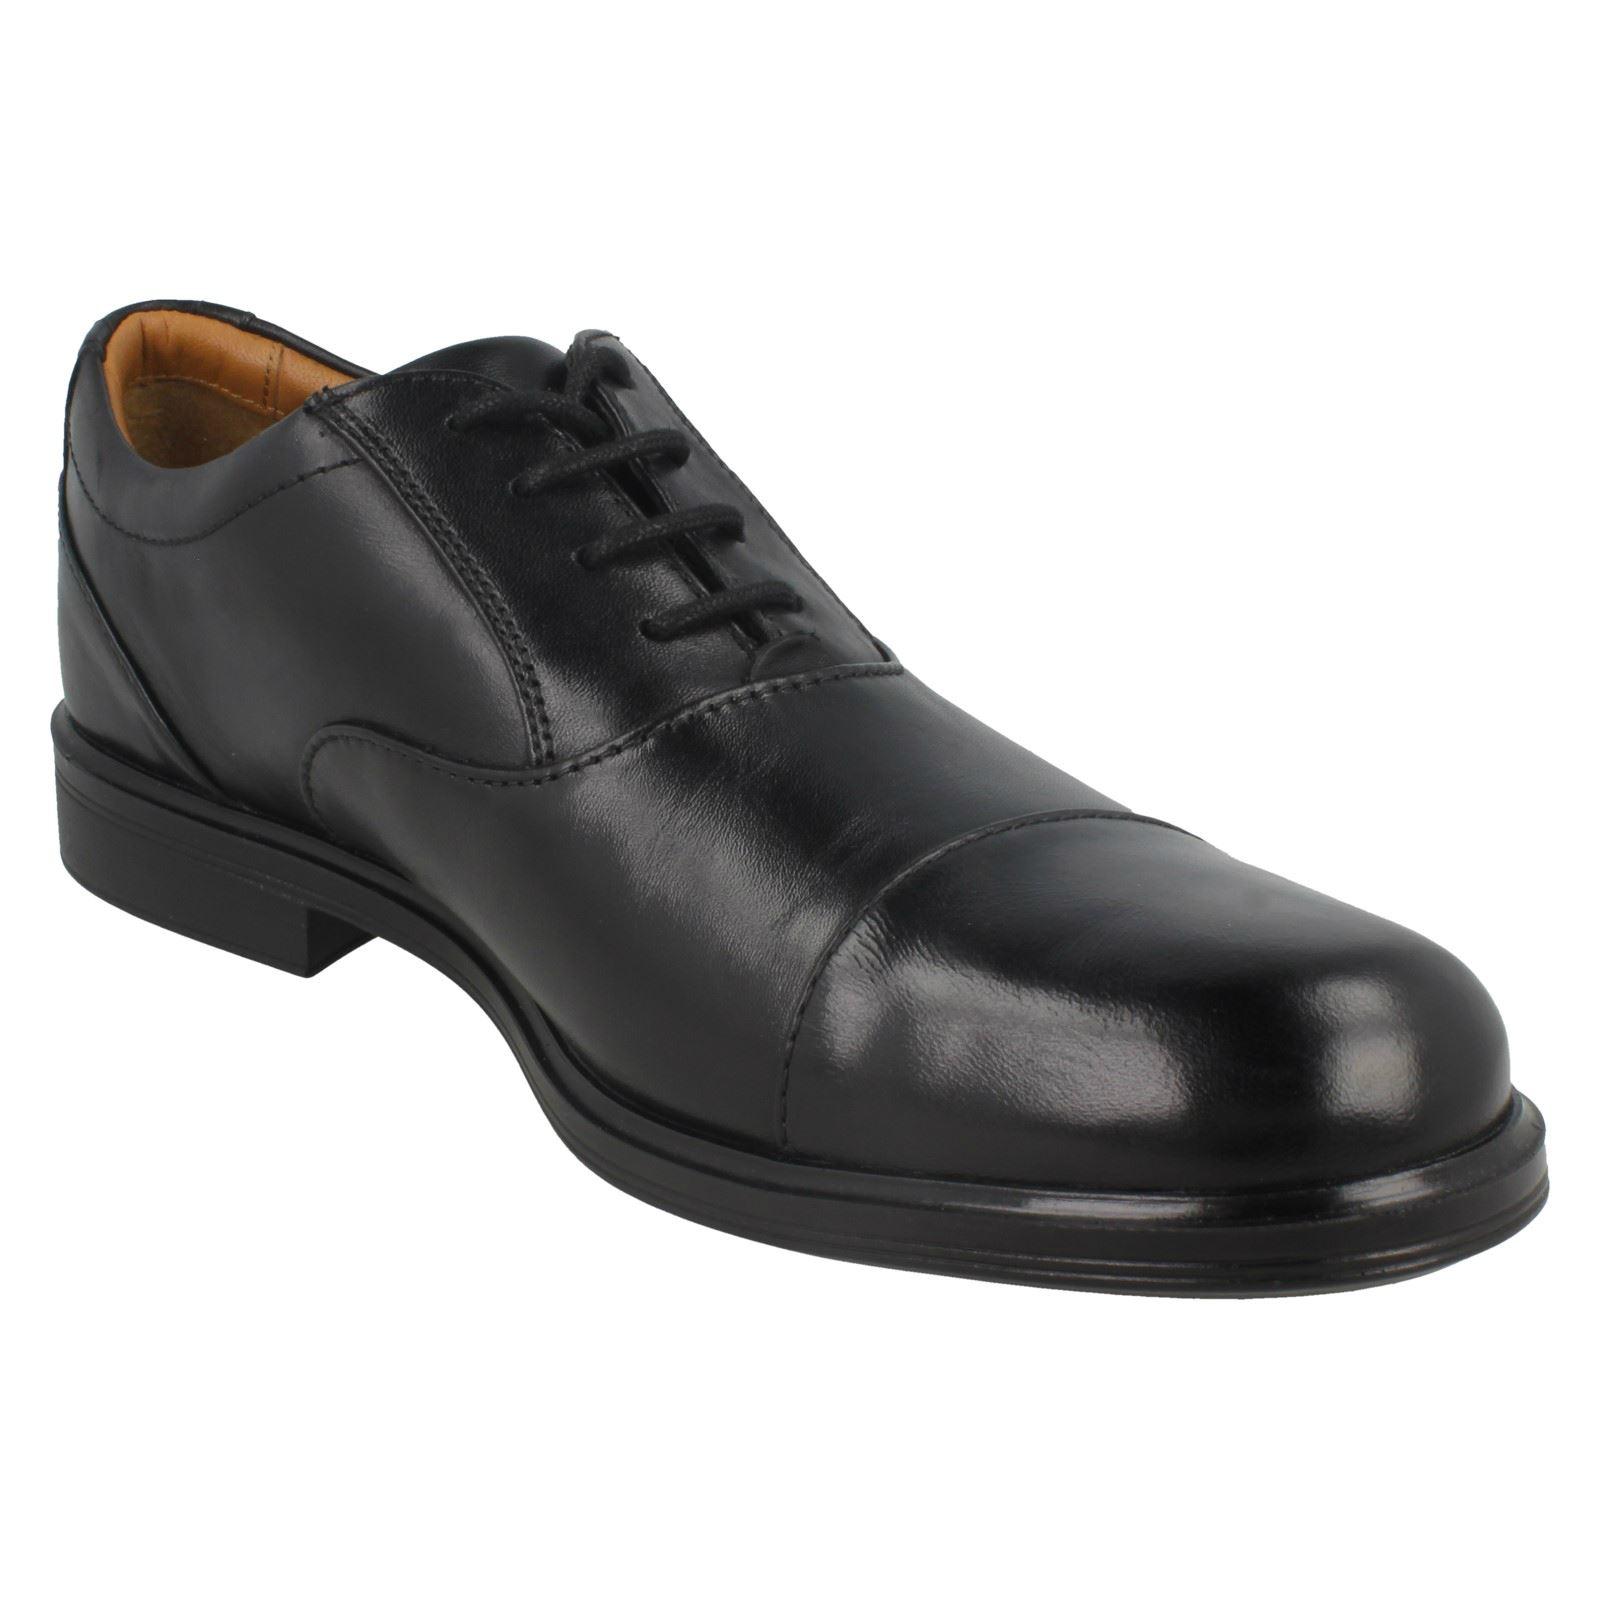 gorra formales cordones Clarks para negro hombre Oxford con de gabson ngwwdqaYx